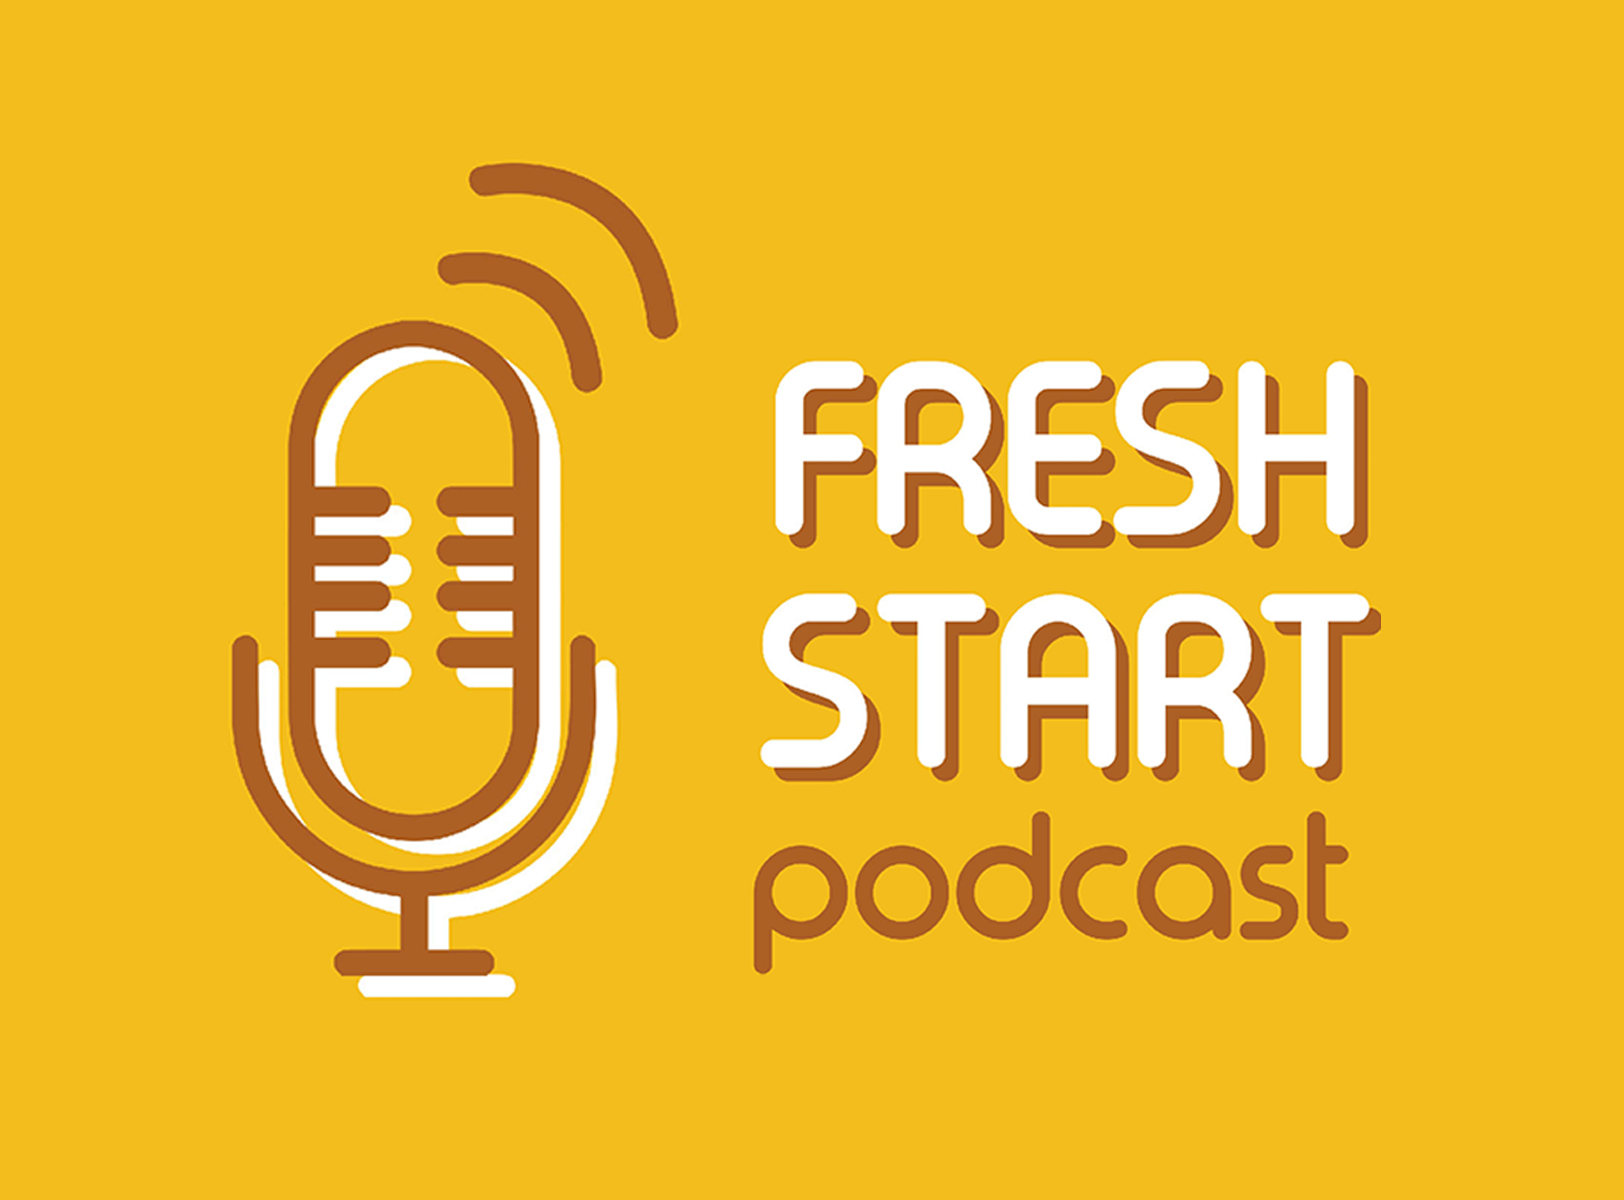 Fresh Start: Podcast News (5/2/2019 Thu.)